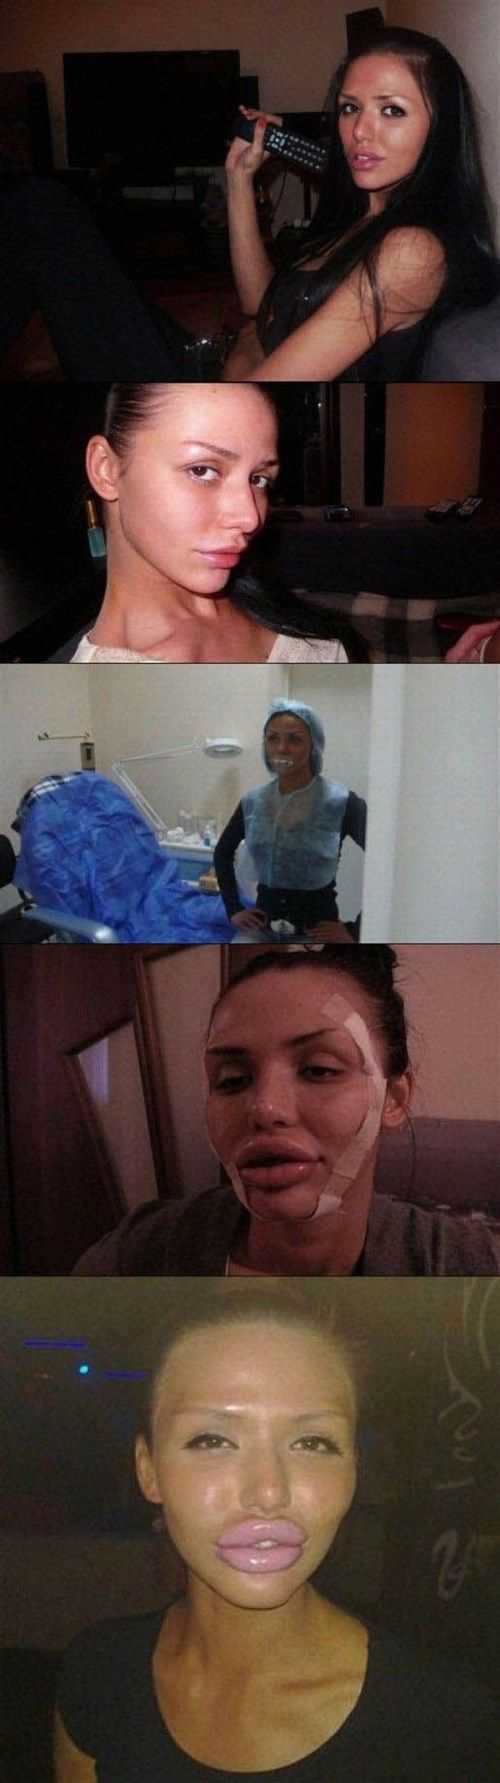 Plastic surgery fail 24 did your plastic surgeon fall asleep on the job